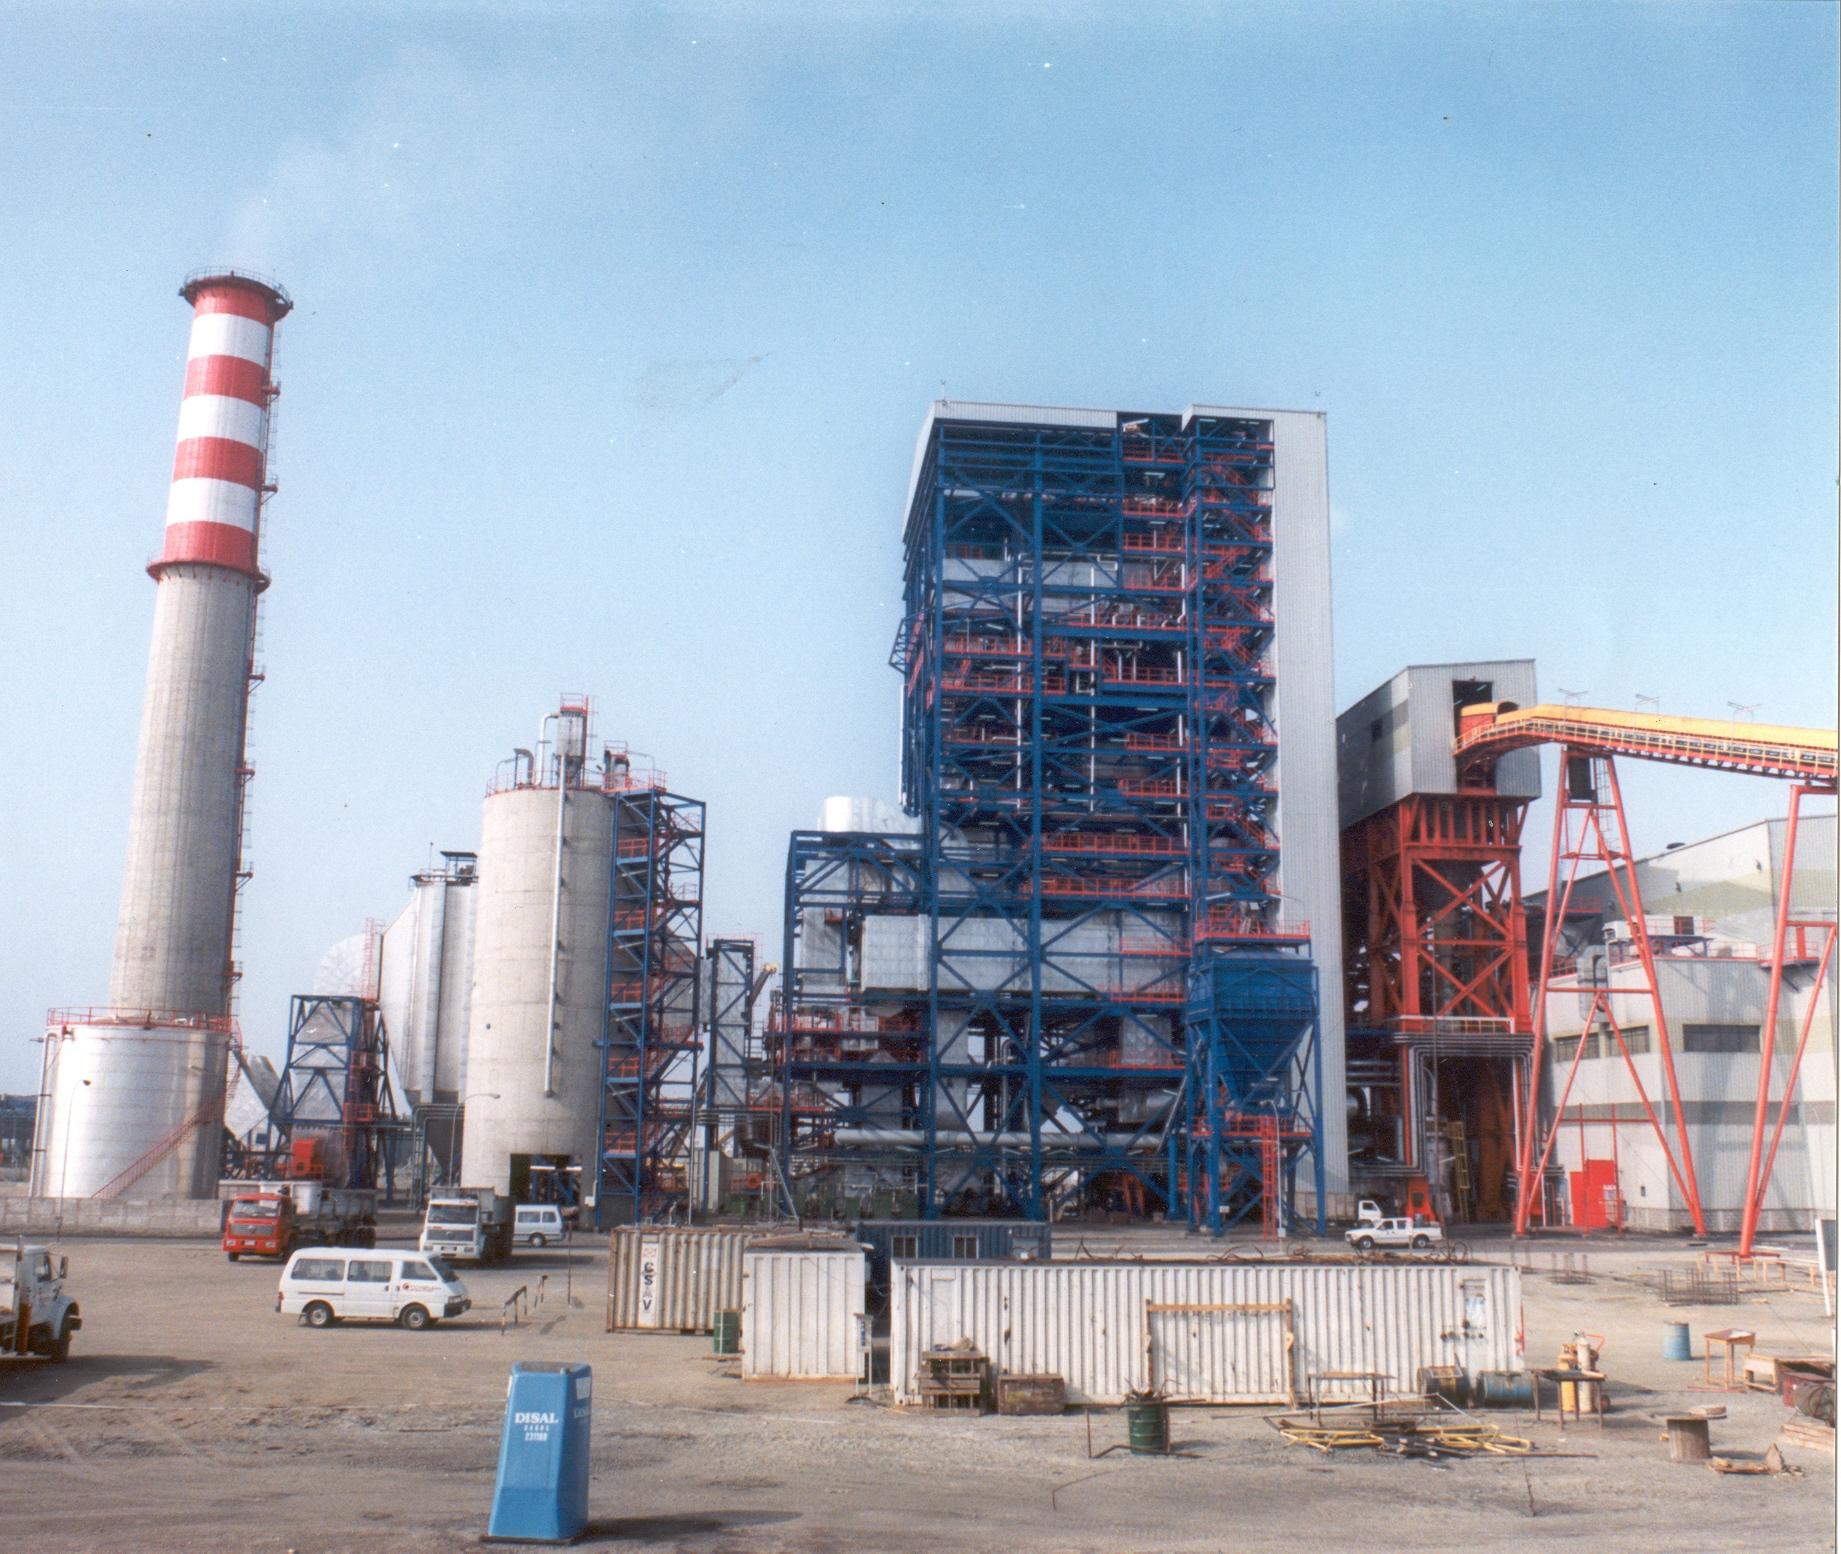 Montaje Integral Central Térmica Mejillones 150 MW (obra civil y montaje electro-mecánico)